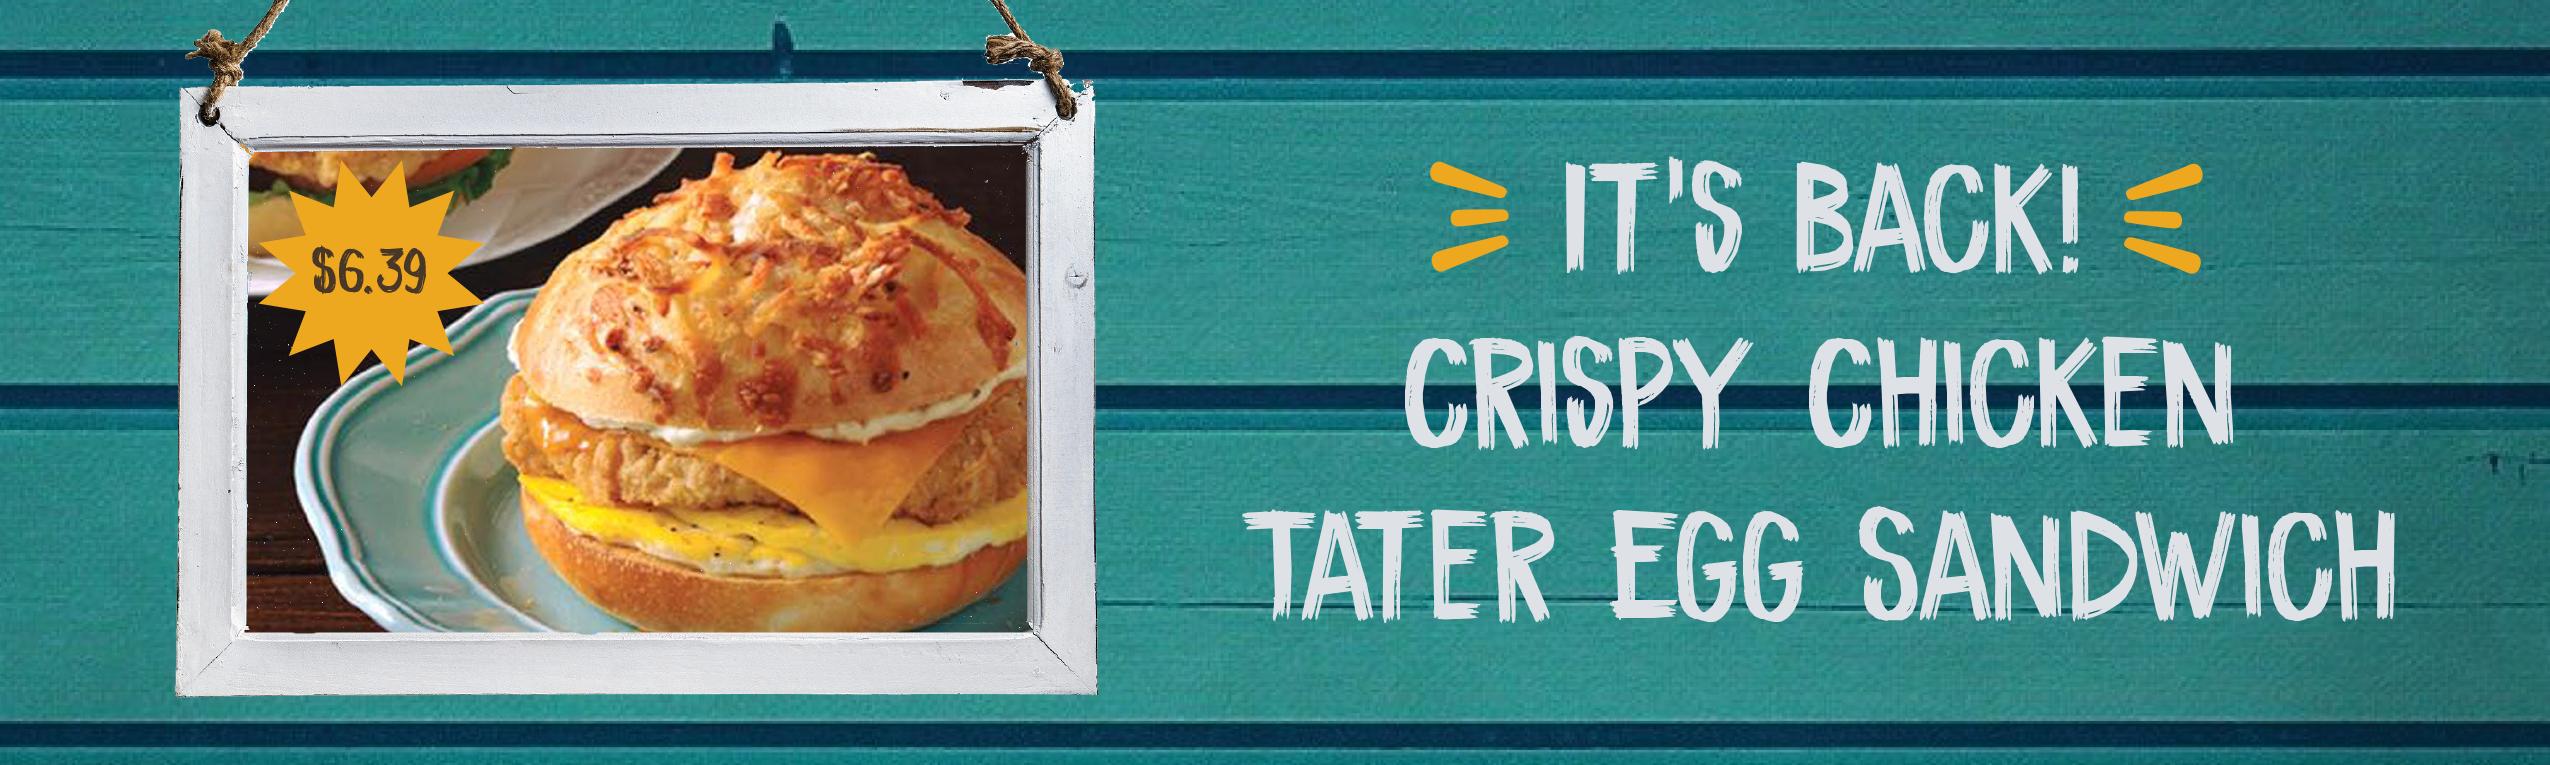 Crispy Chicken Tater Egg Sandwich is back!